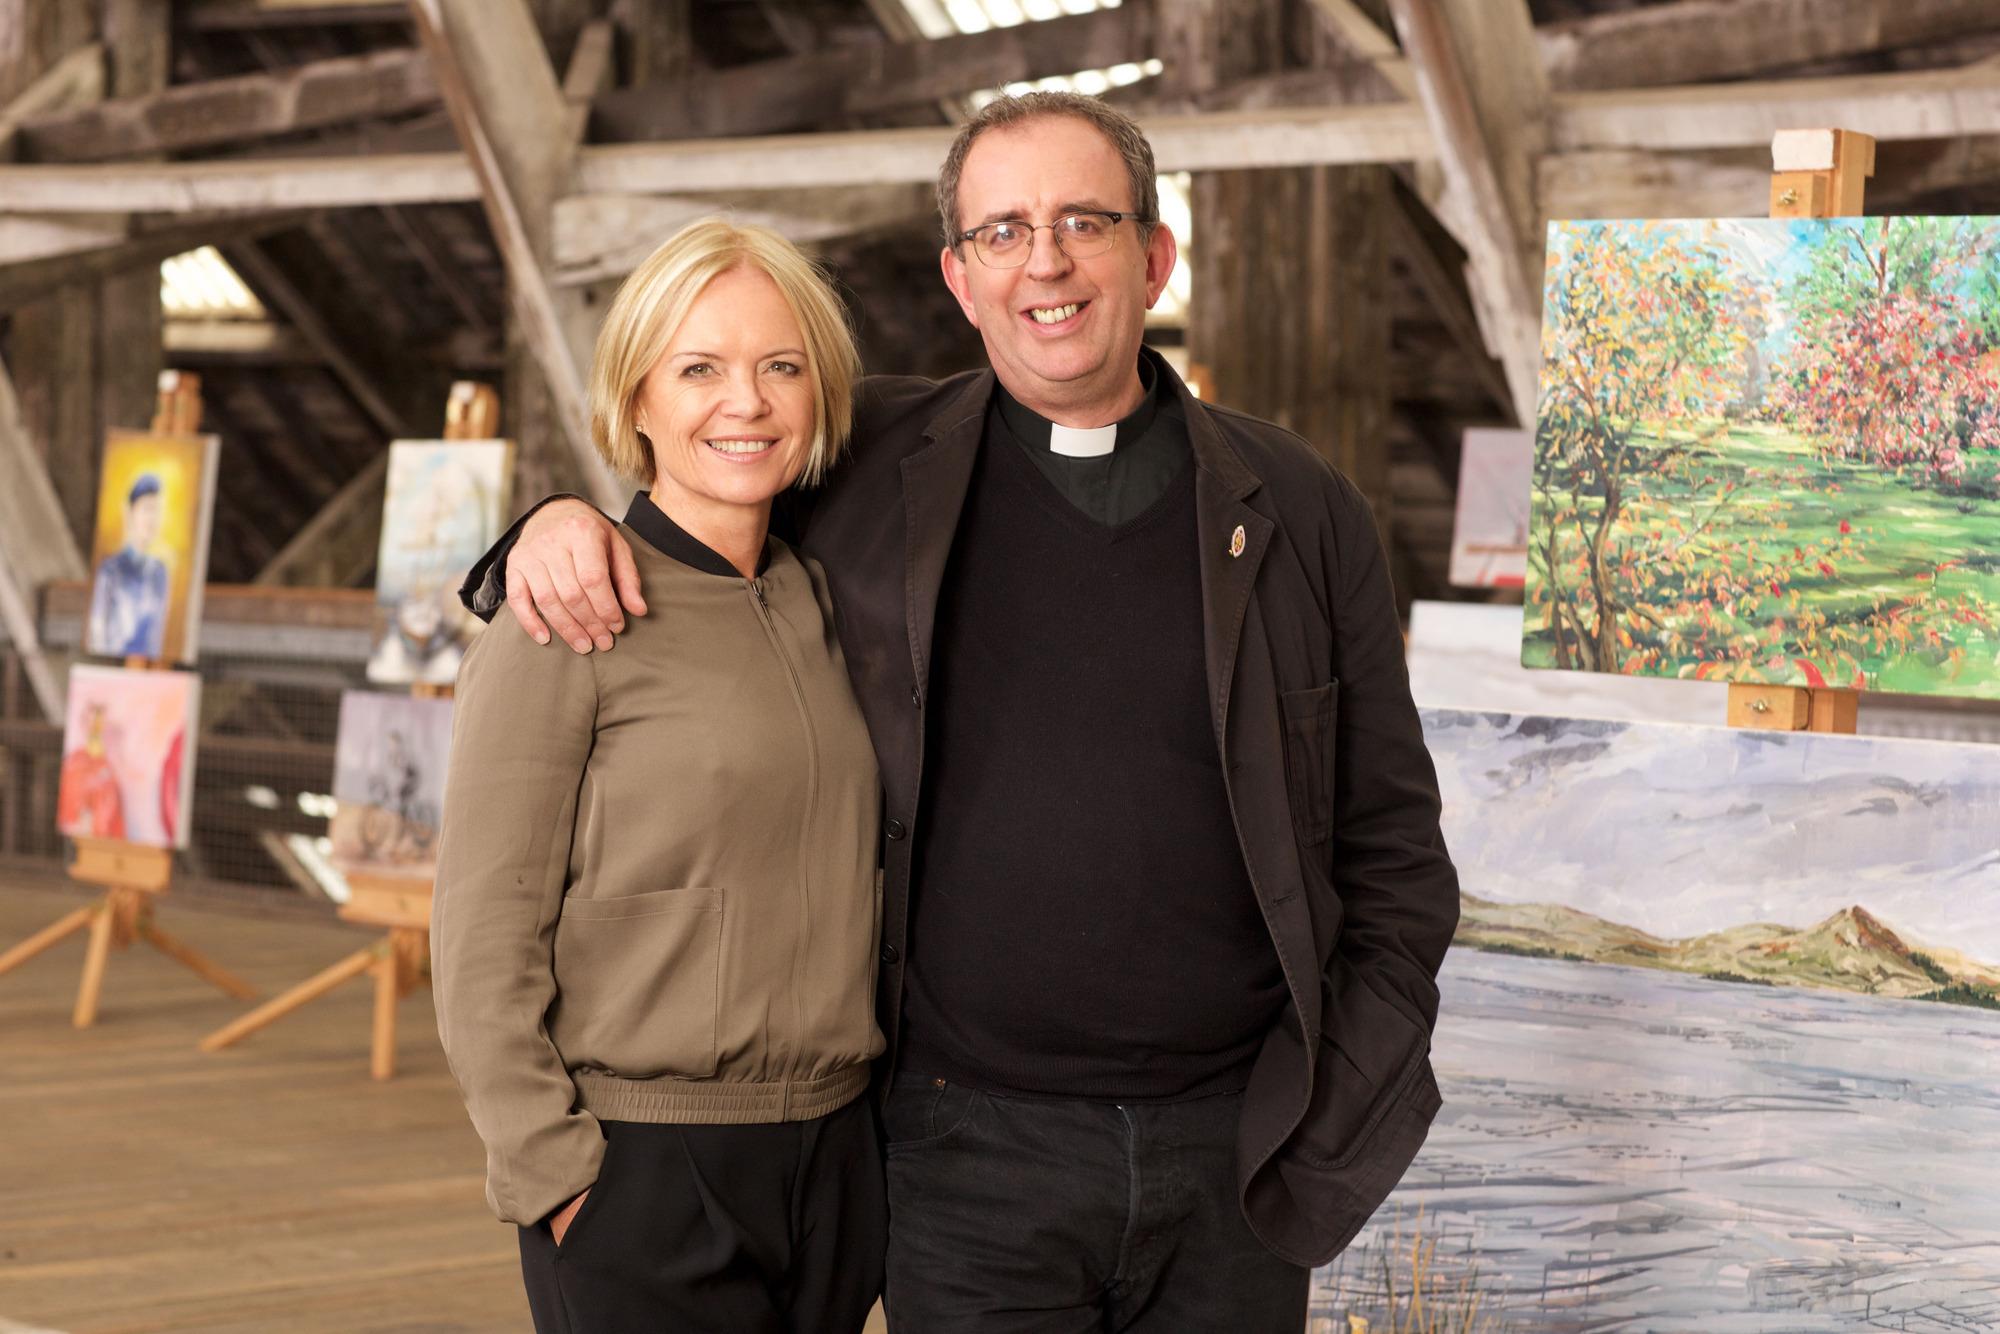 Programme Name: The Big Painting Challenge S3 - TX: n/a - Episode: The Big Painting Challenge S3 - Generics (No. n/a) - Picture Shows: Mariella & Richard (presenters)   - (C) BBC - Photographer: Alan Peebles  BBC, TL